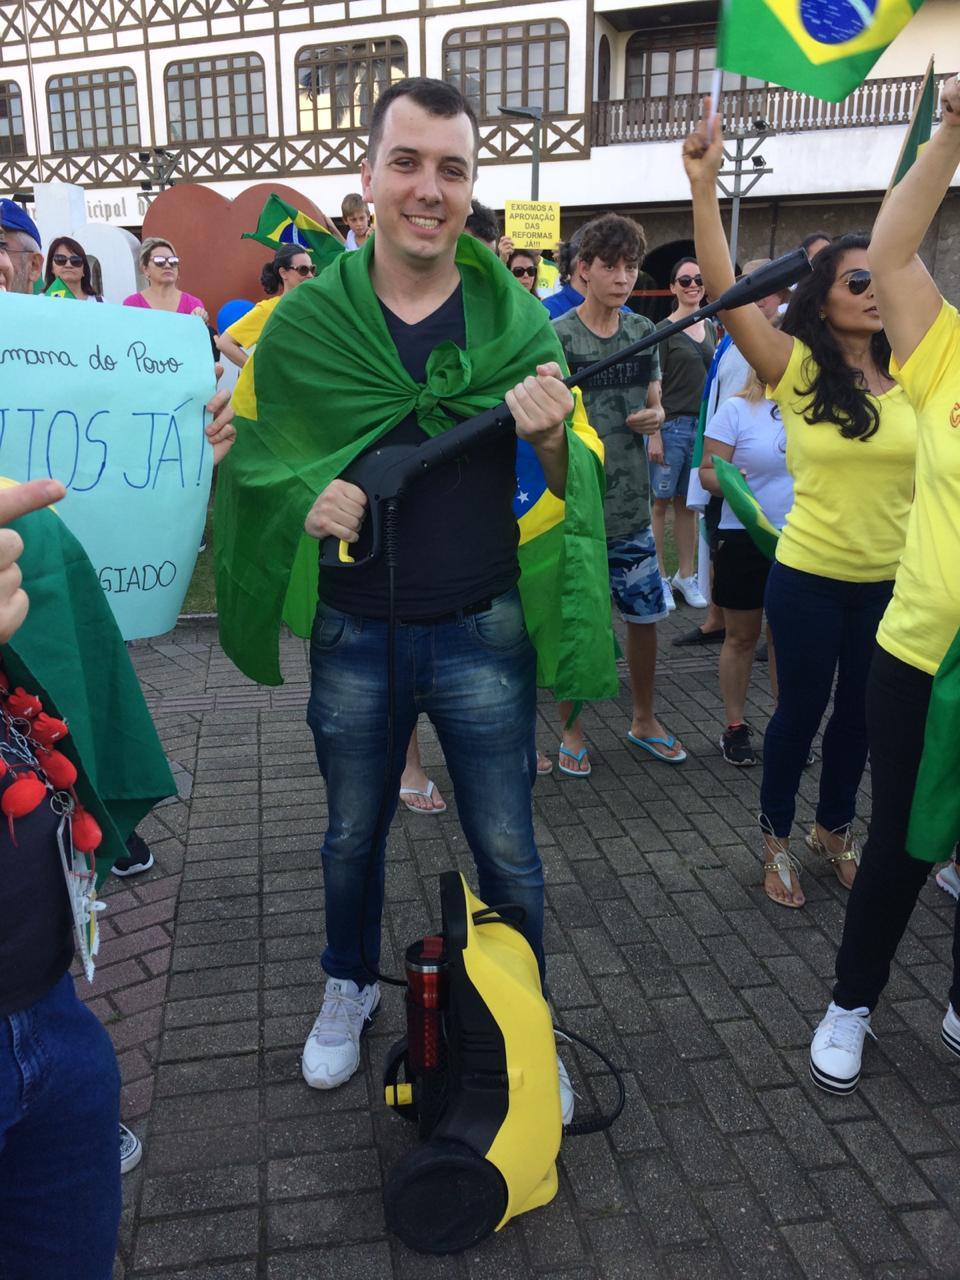 Manifestação em Blumenau - RICTV